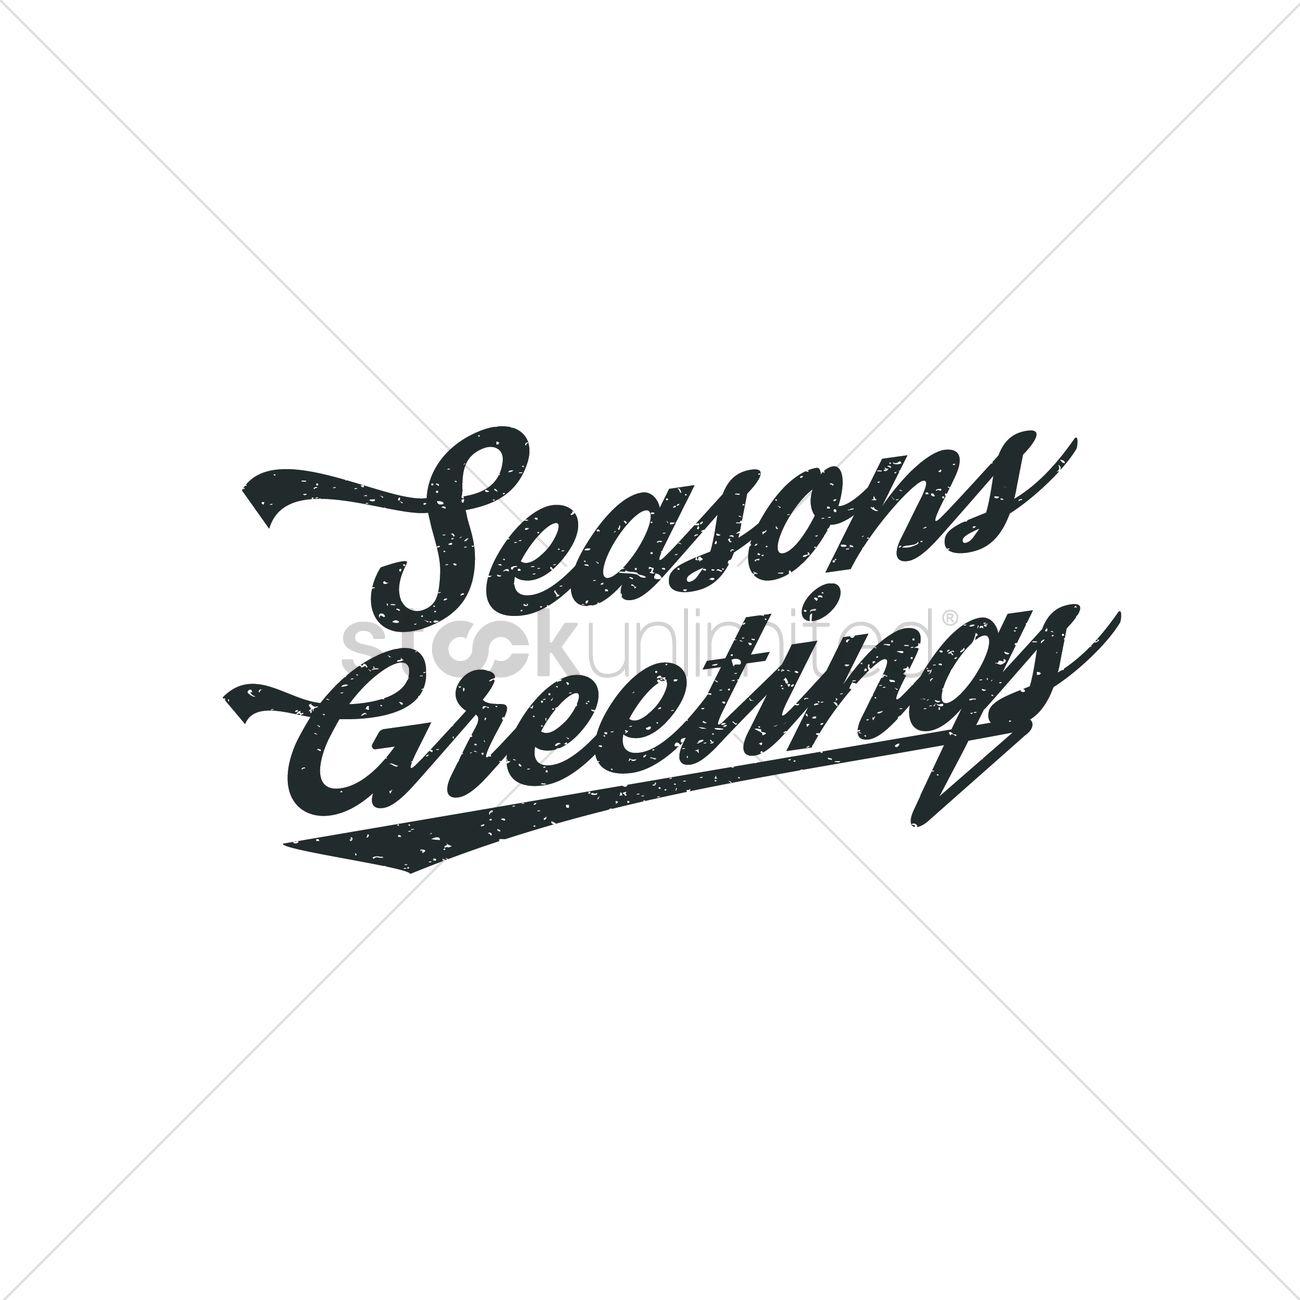 Seasons Greetings Hand Lettering Vector Image 1827250 Stockunlimited